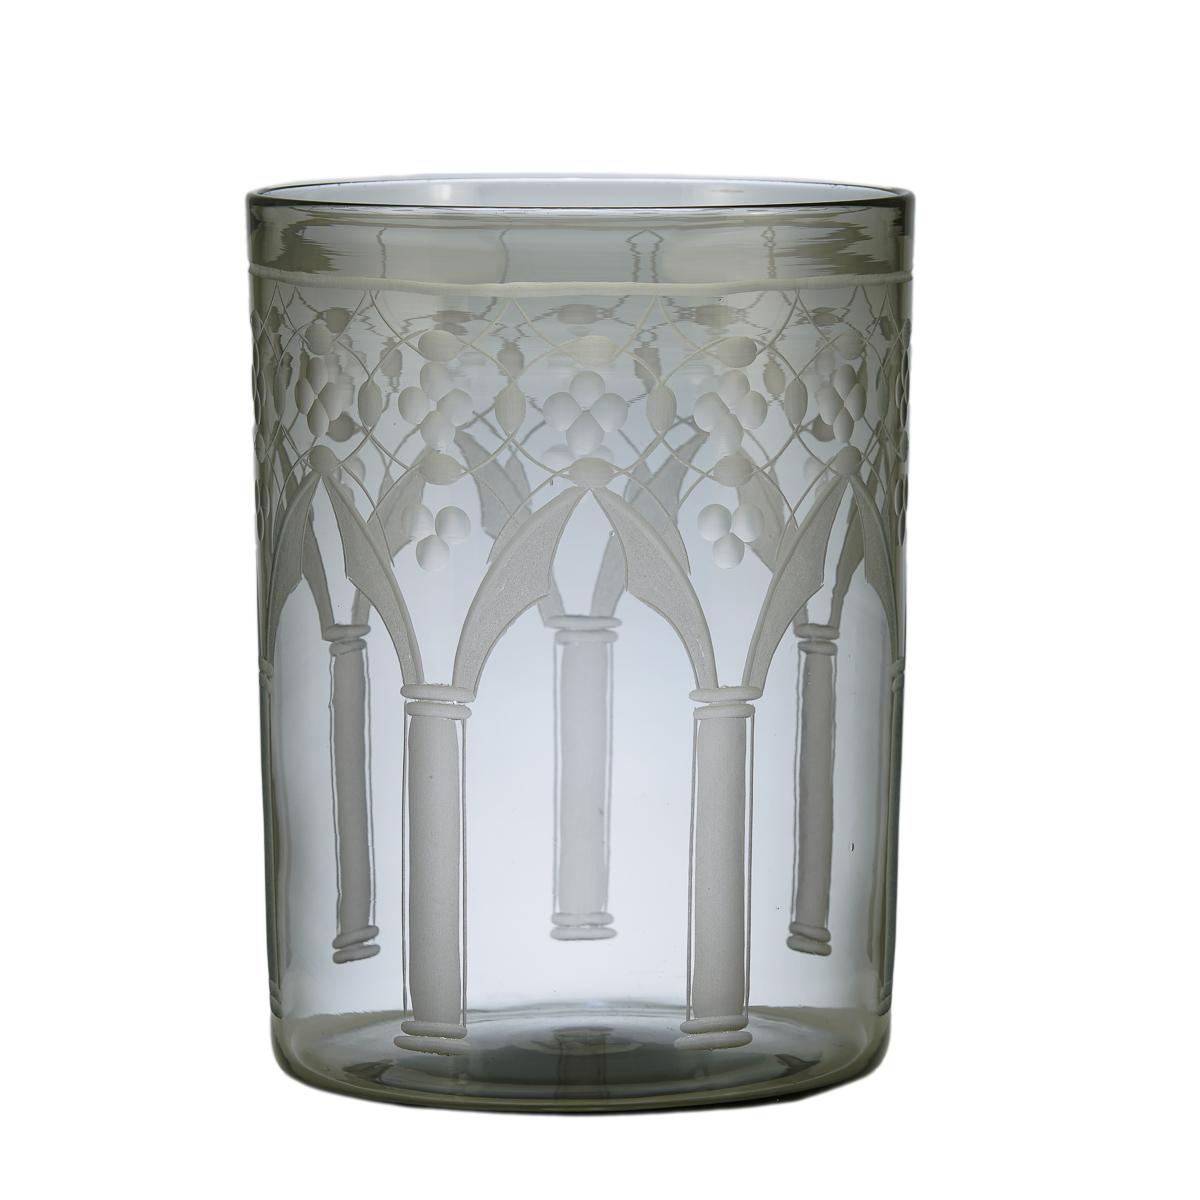 palazzo-ariani-vase-candle-crystal-grey-murano-giberto-design-precious-luxury-handmade-flower